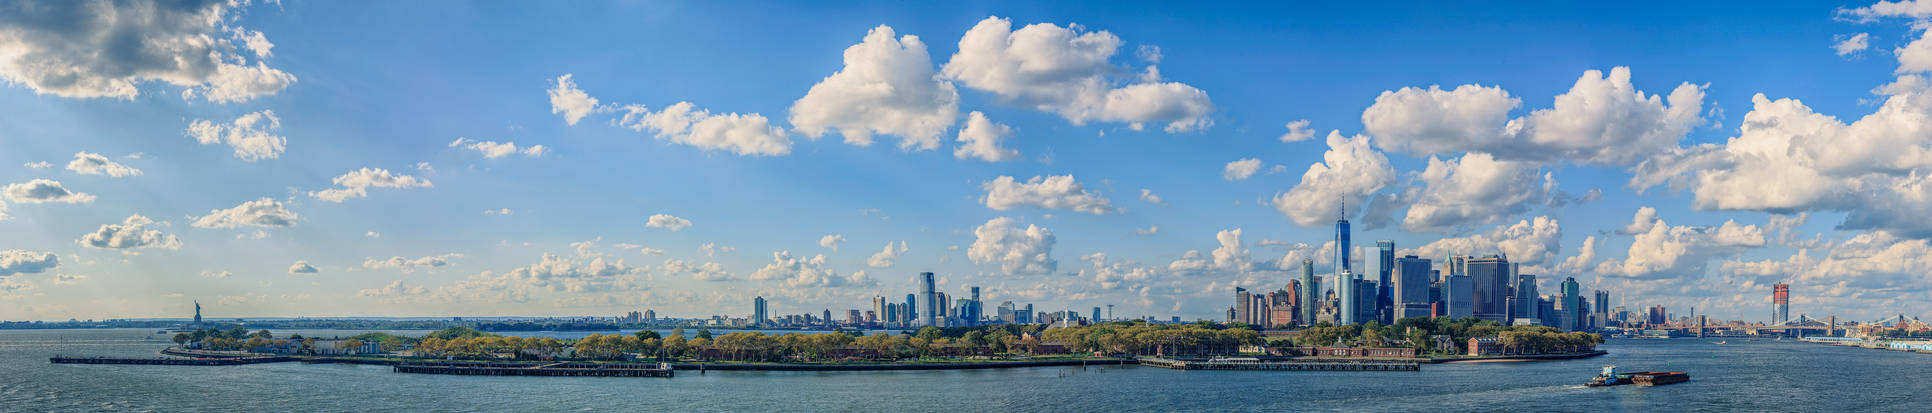 Brooklyn Harbor View by ian-roberts